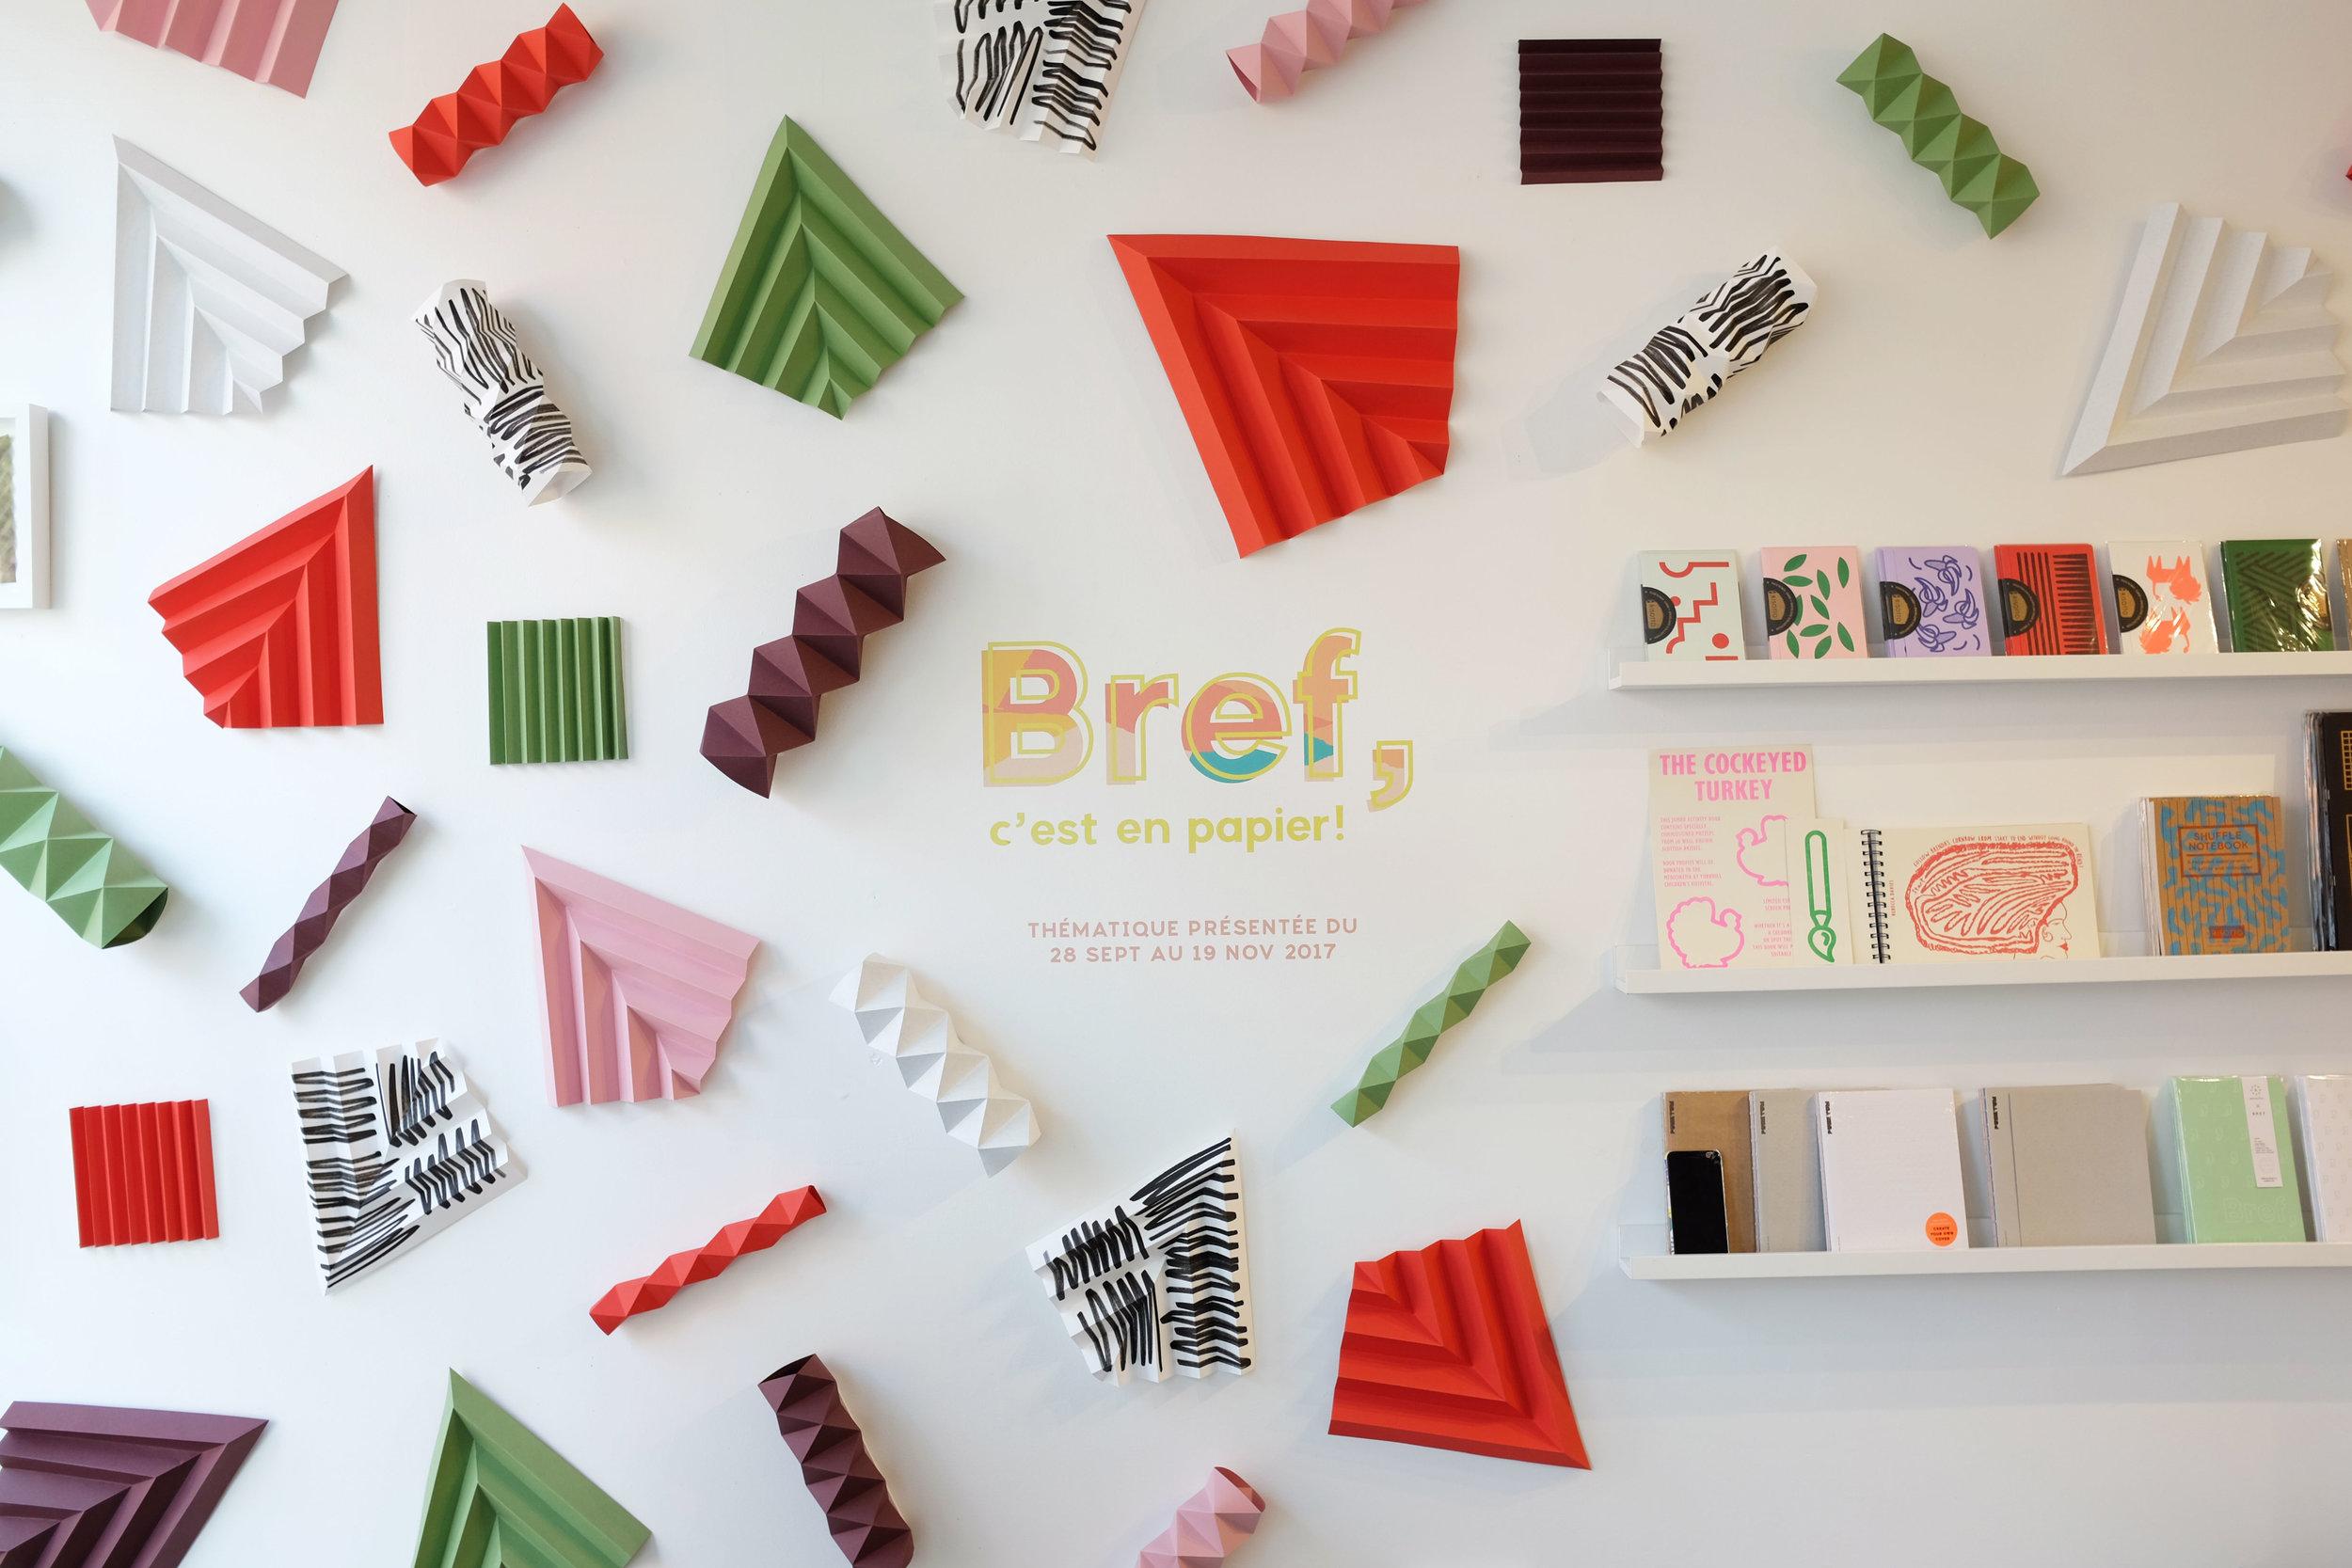 pauline-loctin-origami-paper-art-fold-mural-Miss-cloudy-x-bref-installation.jpg